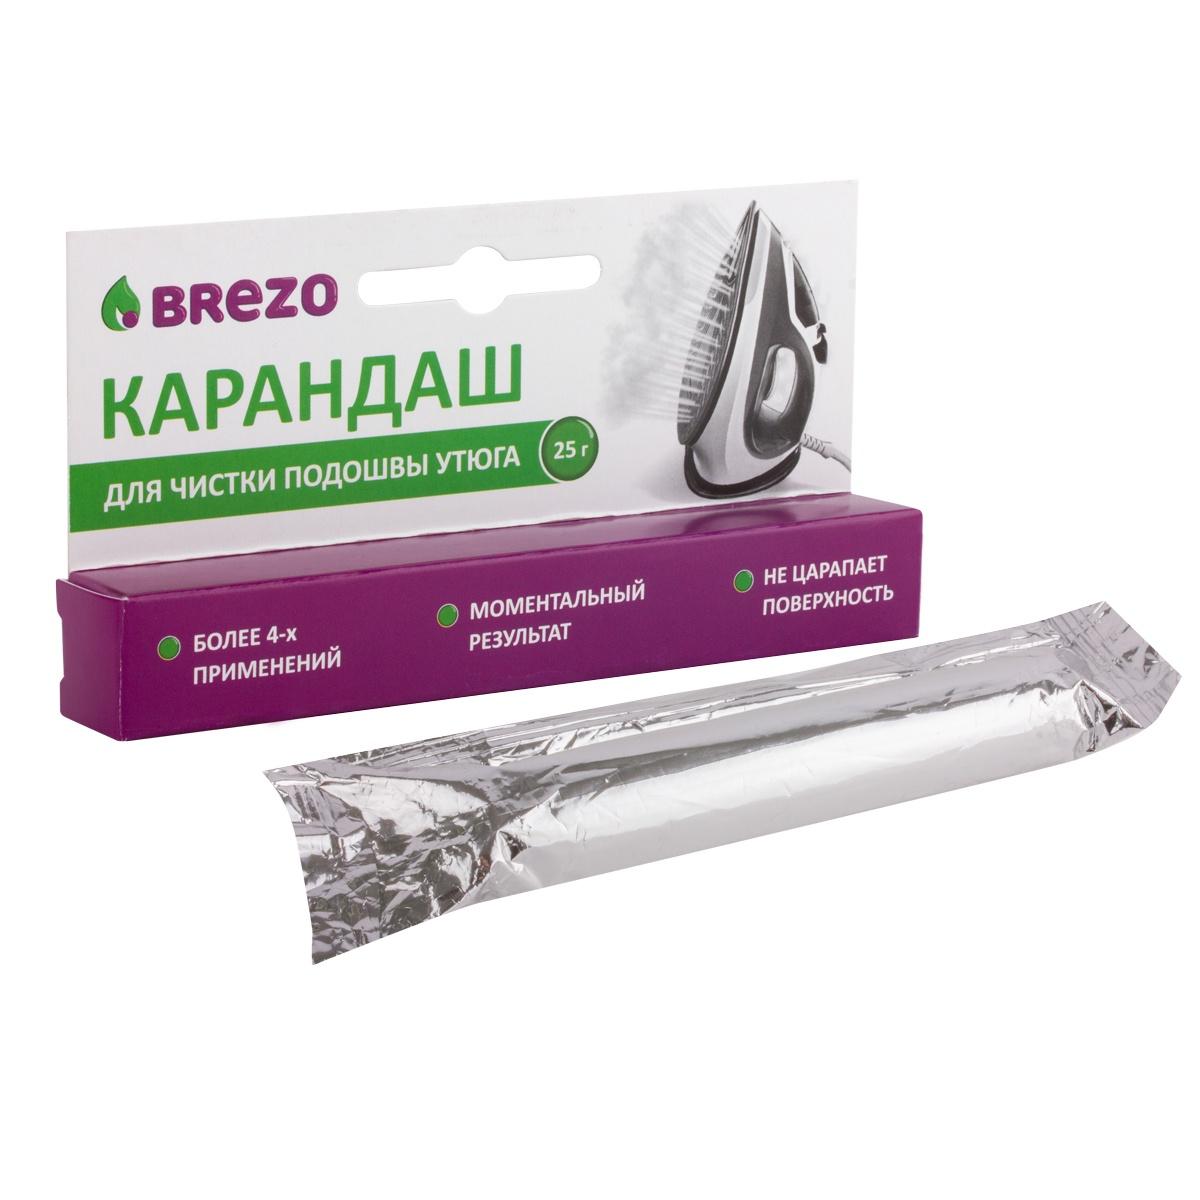 Карандаш для чистки подошвы утюга, 25 г. карандаш для чистки подошвы утюга top house 32 г